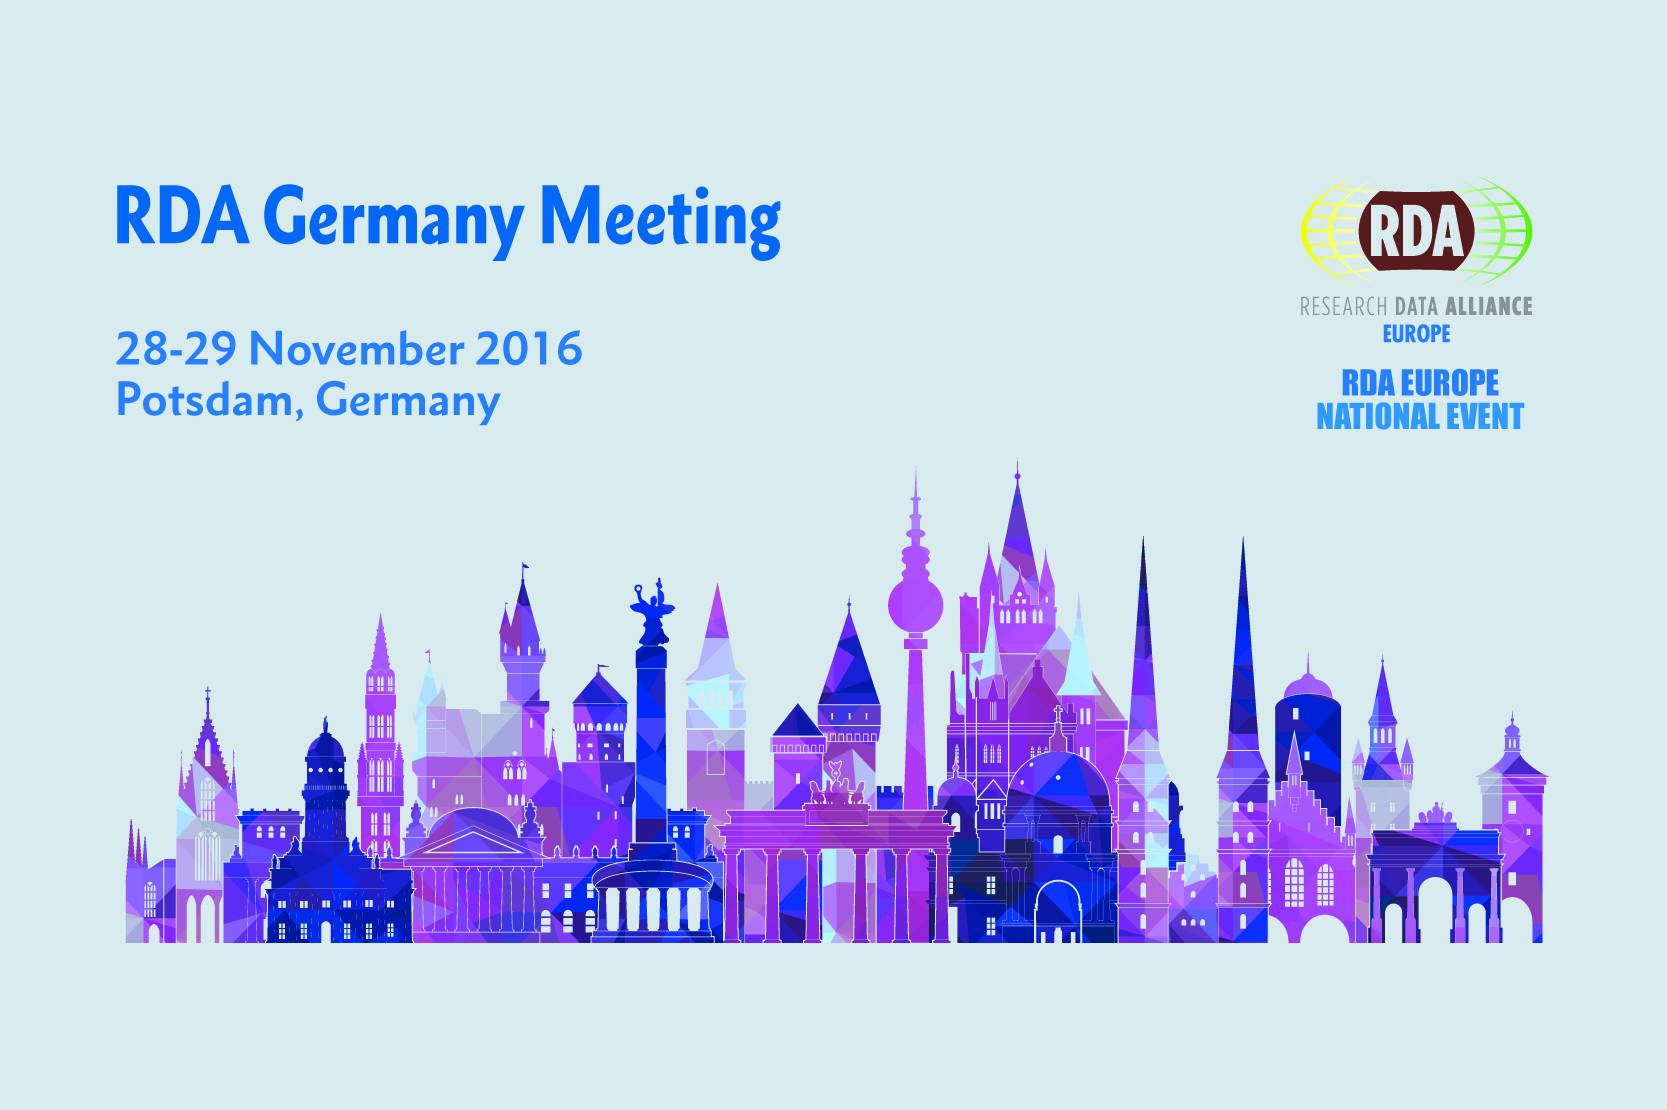 RDA Germany Meeting 2016, 28-29 November 2016, Potsdam, Germany